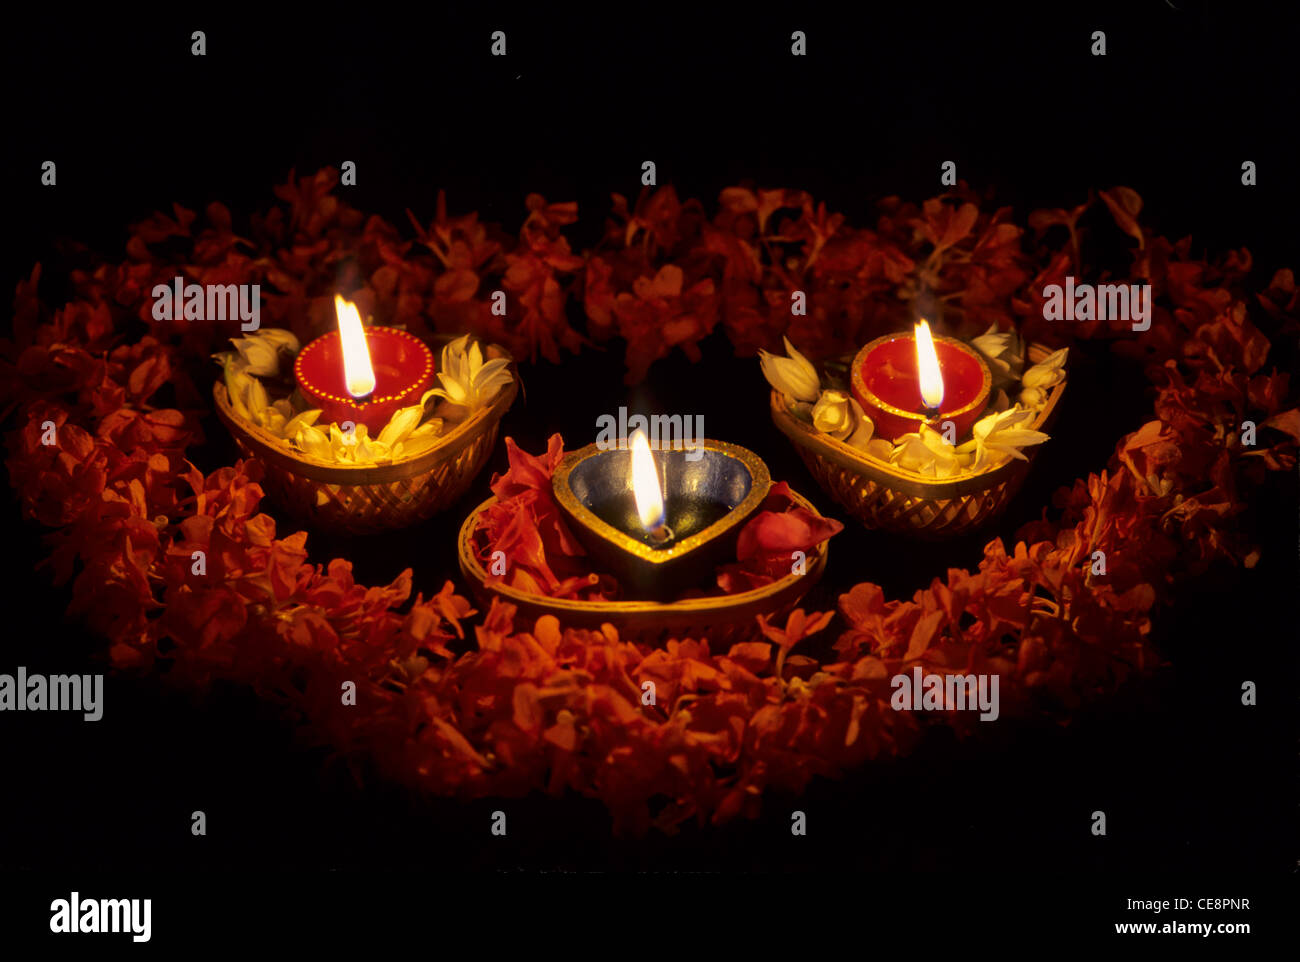 Stp 81266 diwali indian festival greeting card design oil lamps stp 81266 diwali indian festival greeting card design oil lamps india m4hsunfo